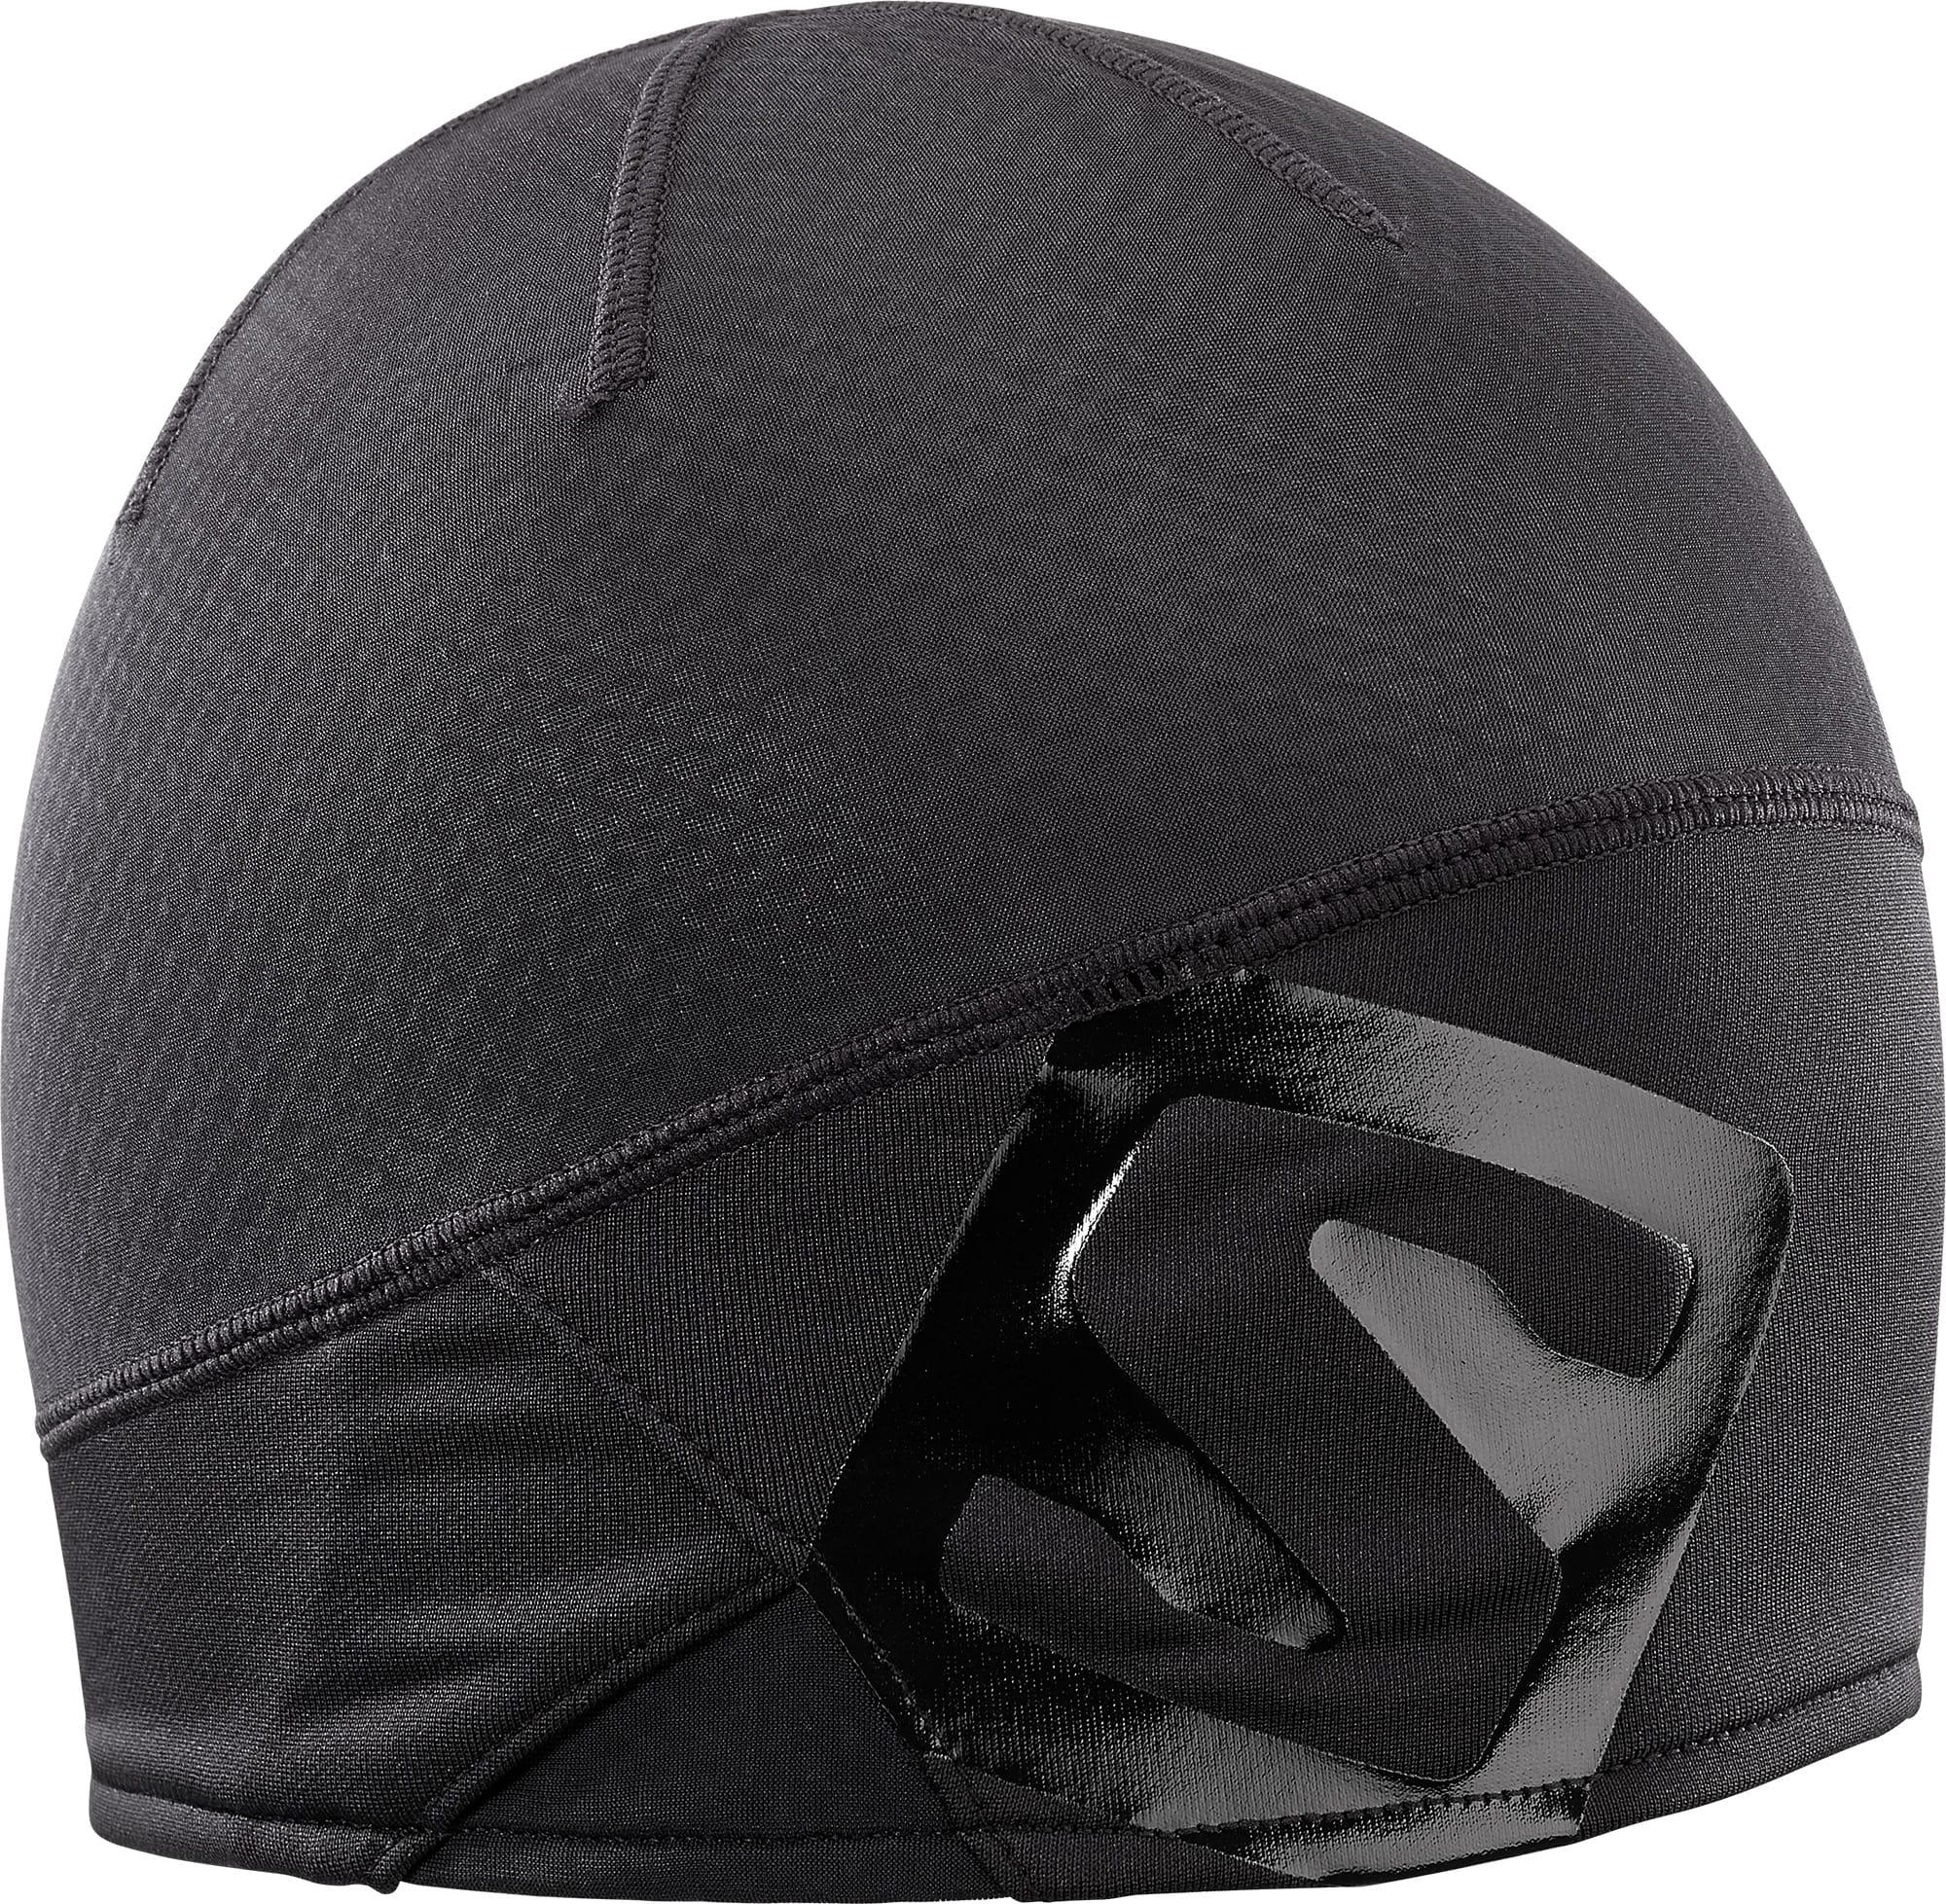 Czapka SALOMON RS Pro Beanie Black